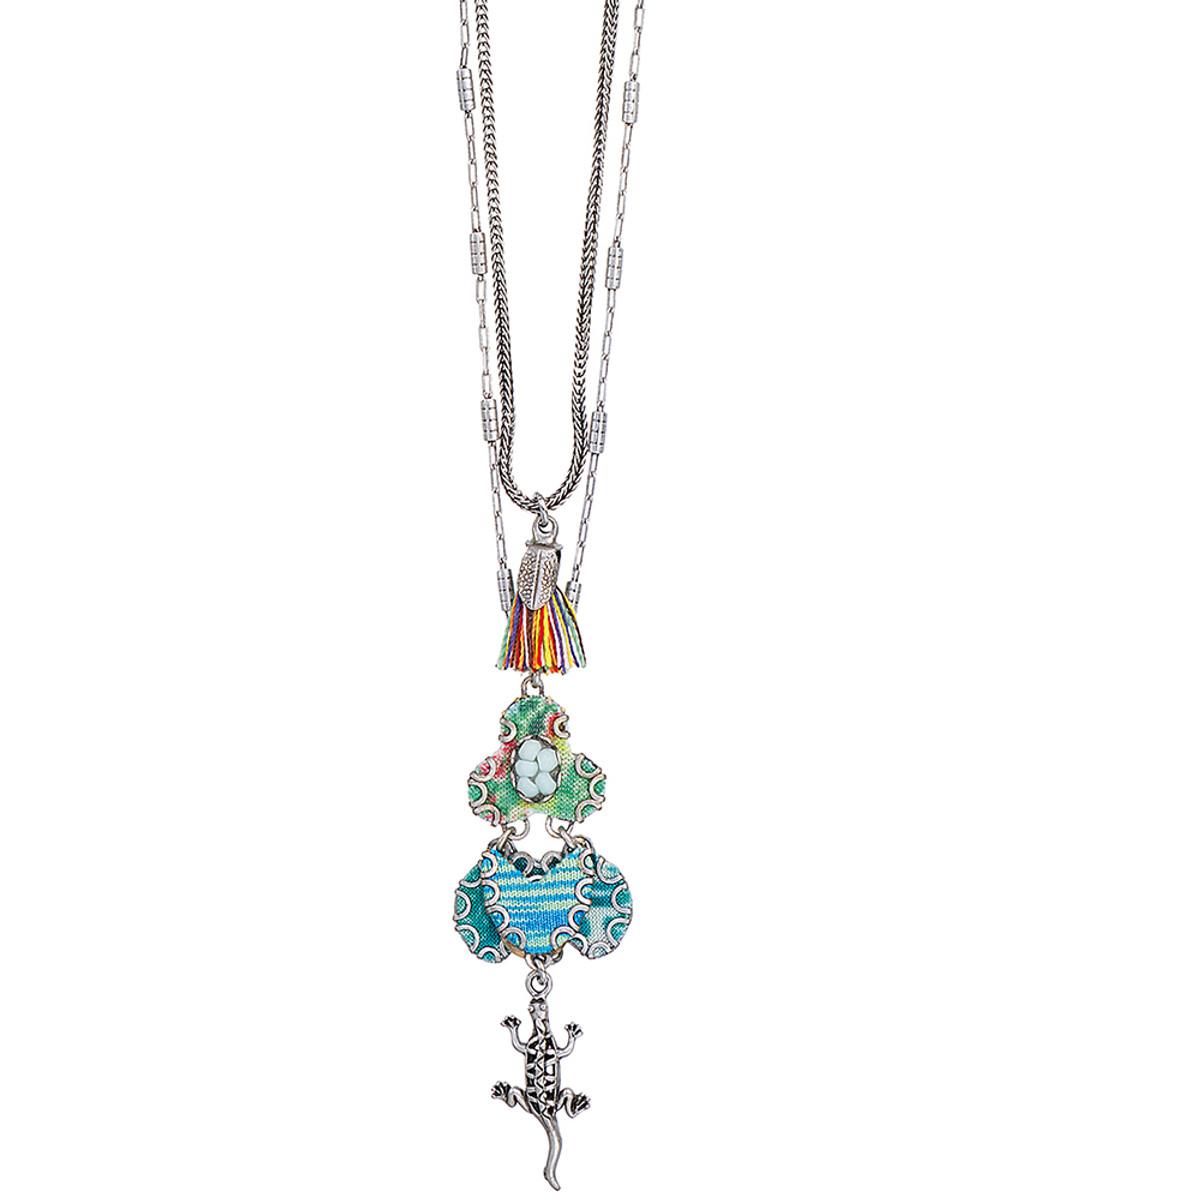 Ayala Bar Rio Celeste Long and Layered Necklace